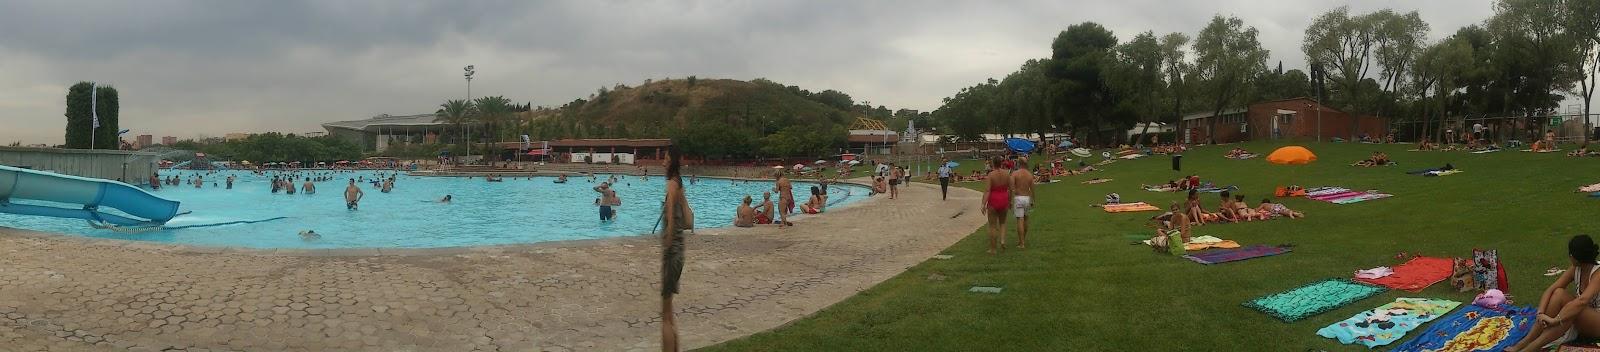 Cole adictas dia de piscina for Pulpo para piscina